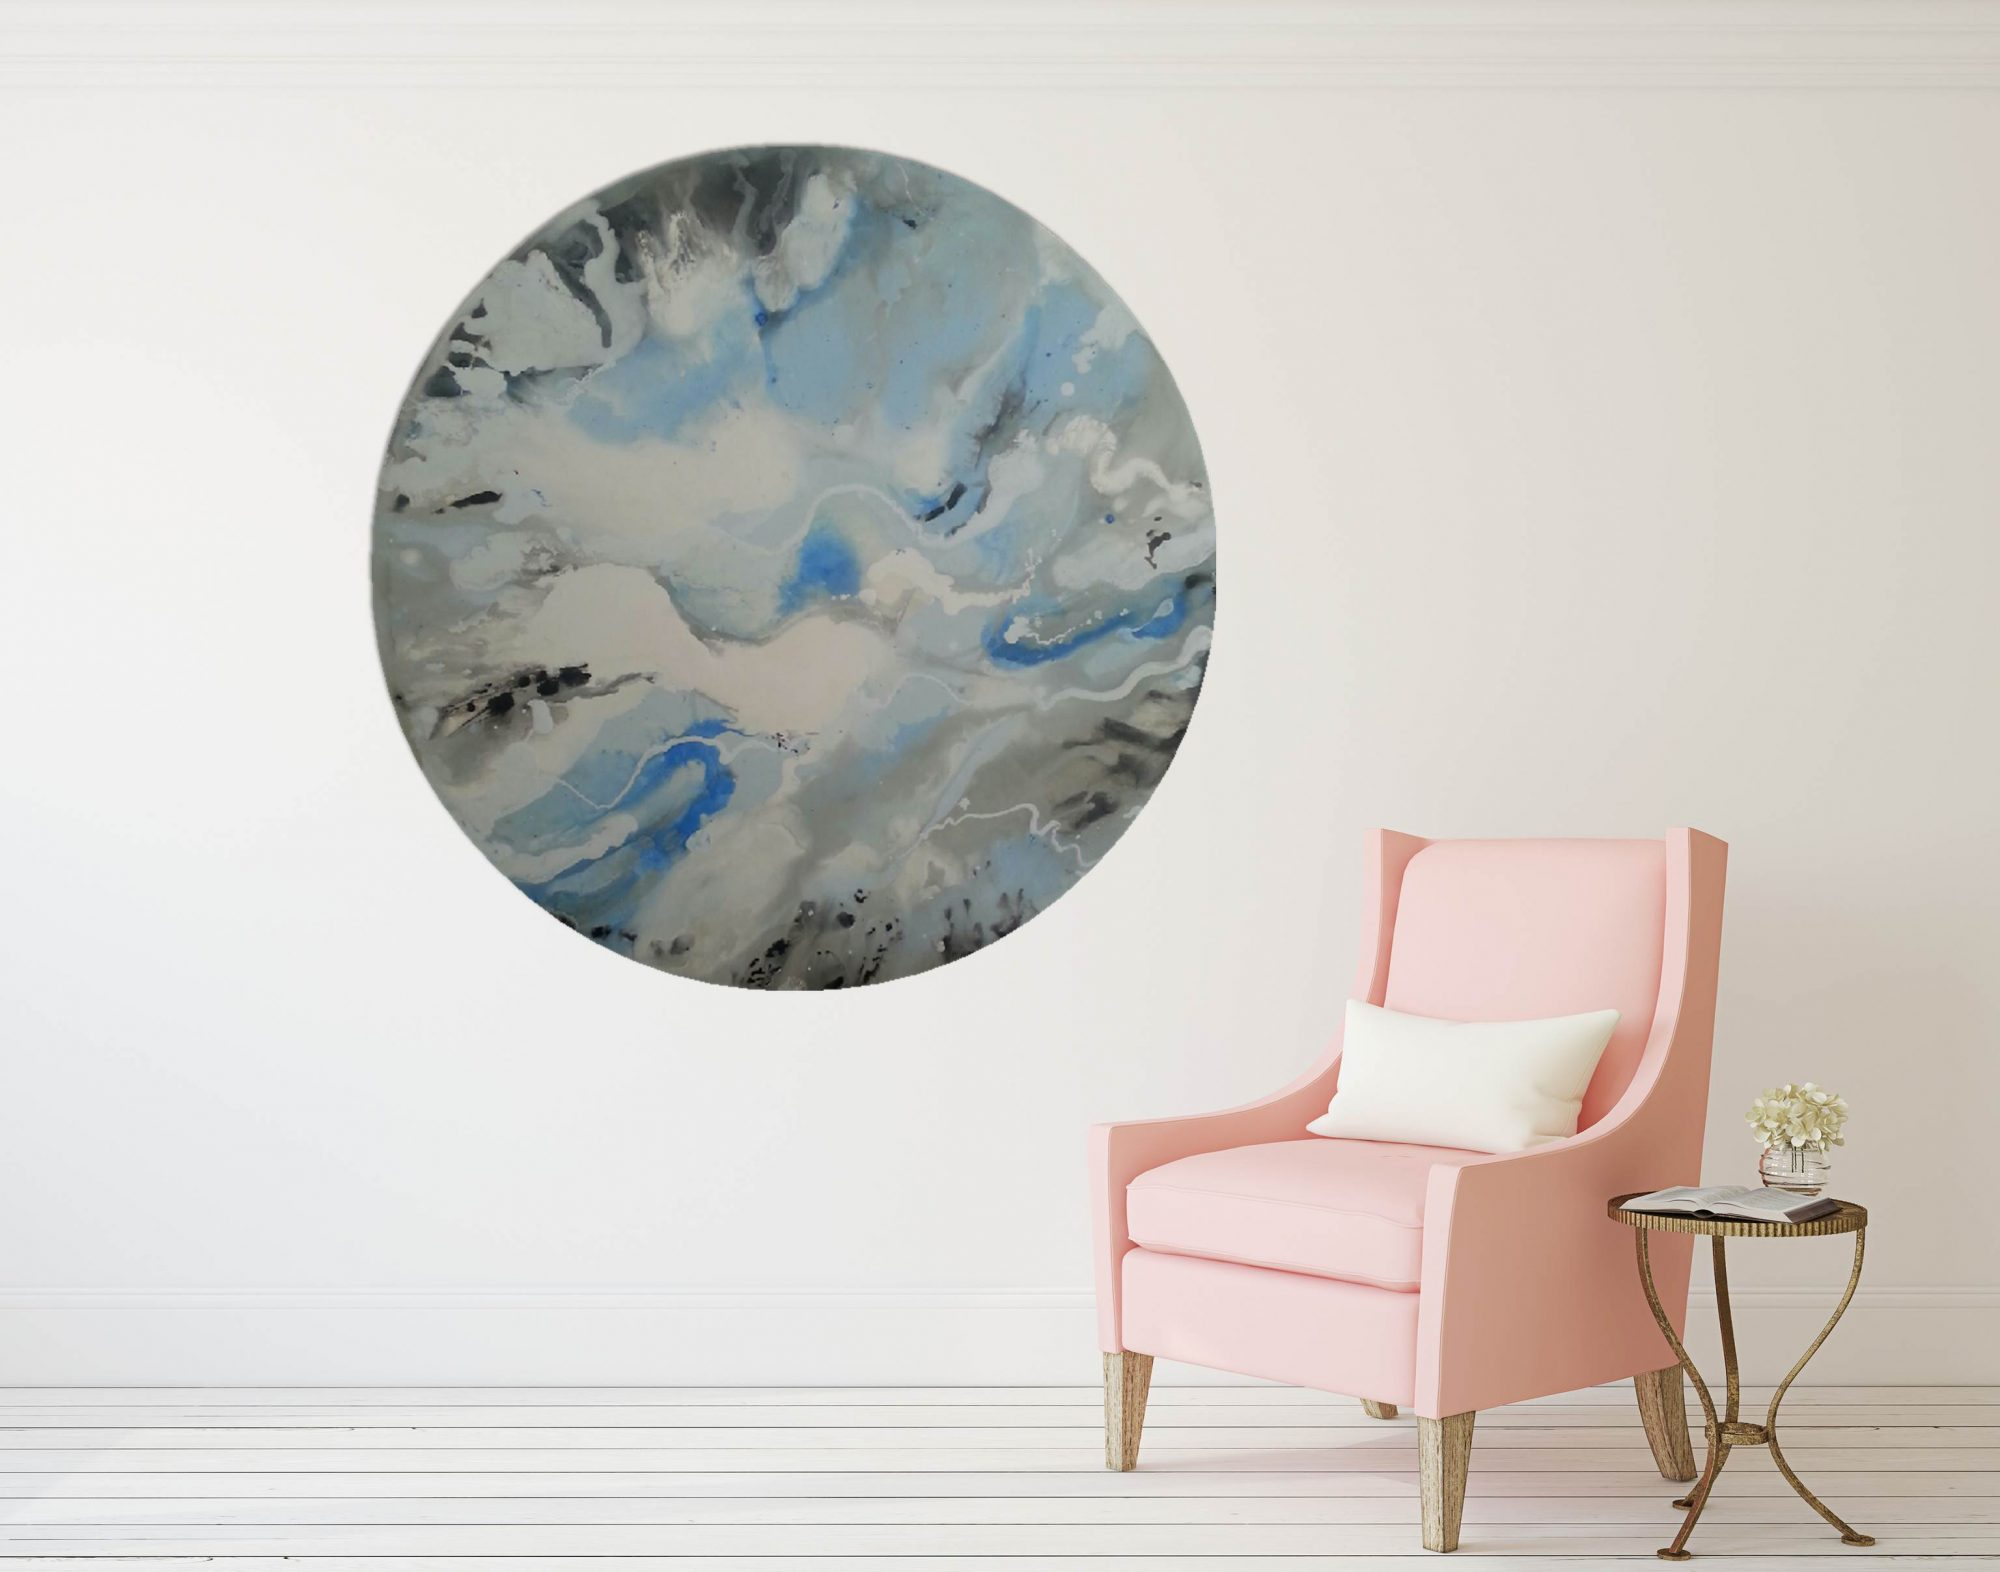 coastal-days-alternative-pink-chair